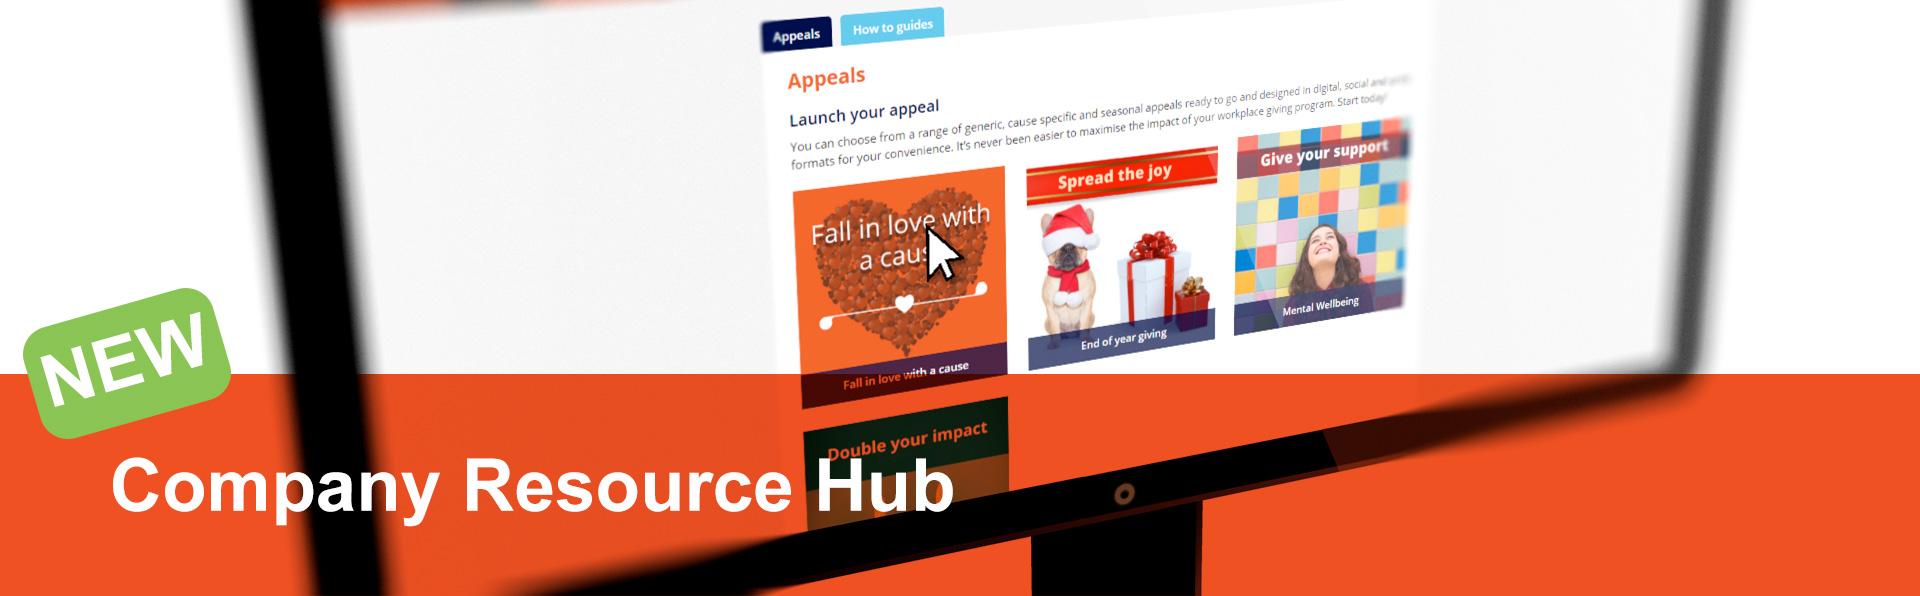 0916-company-resource-hub-tab-banner